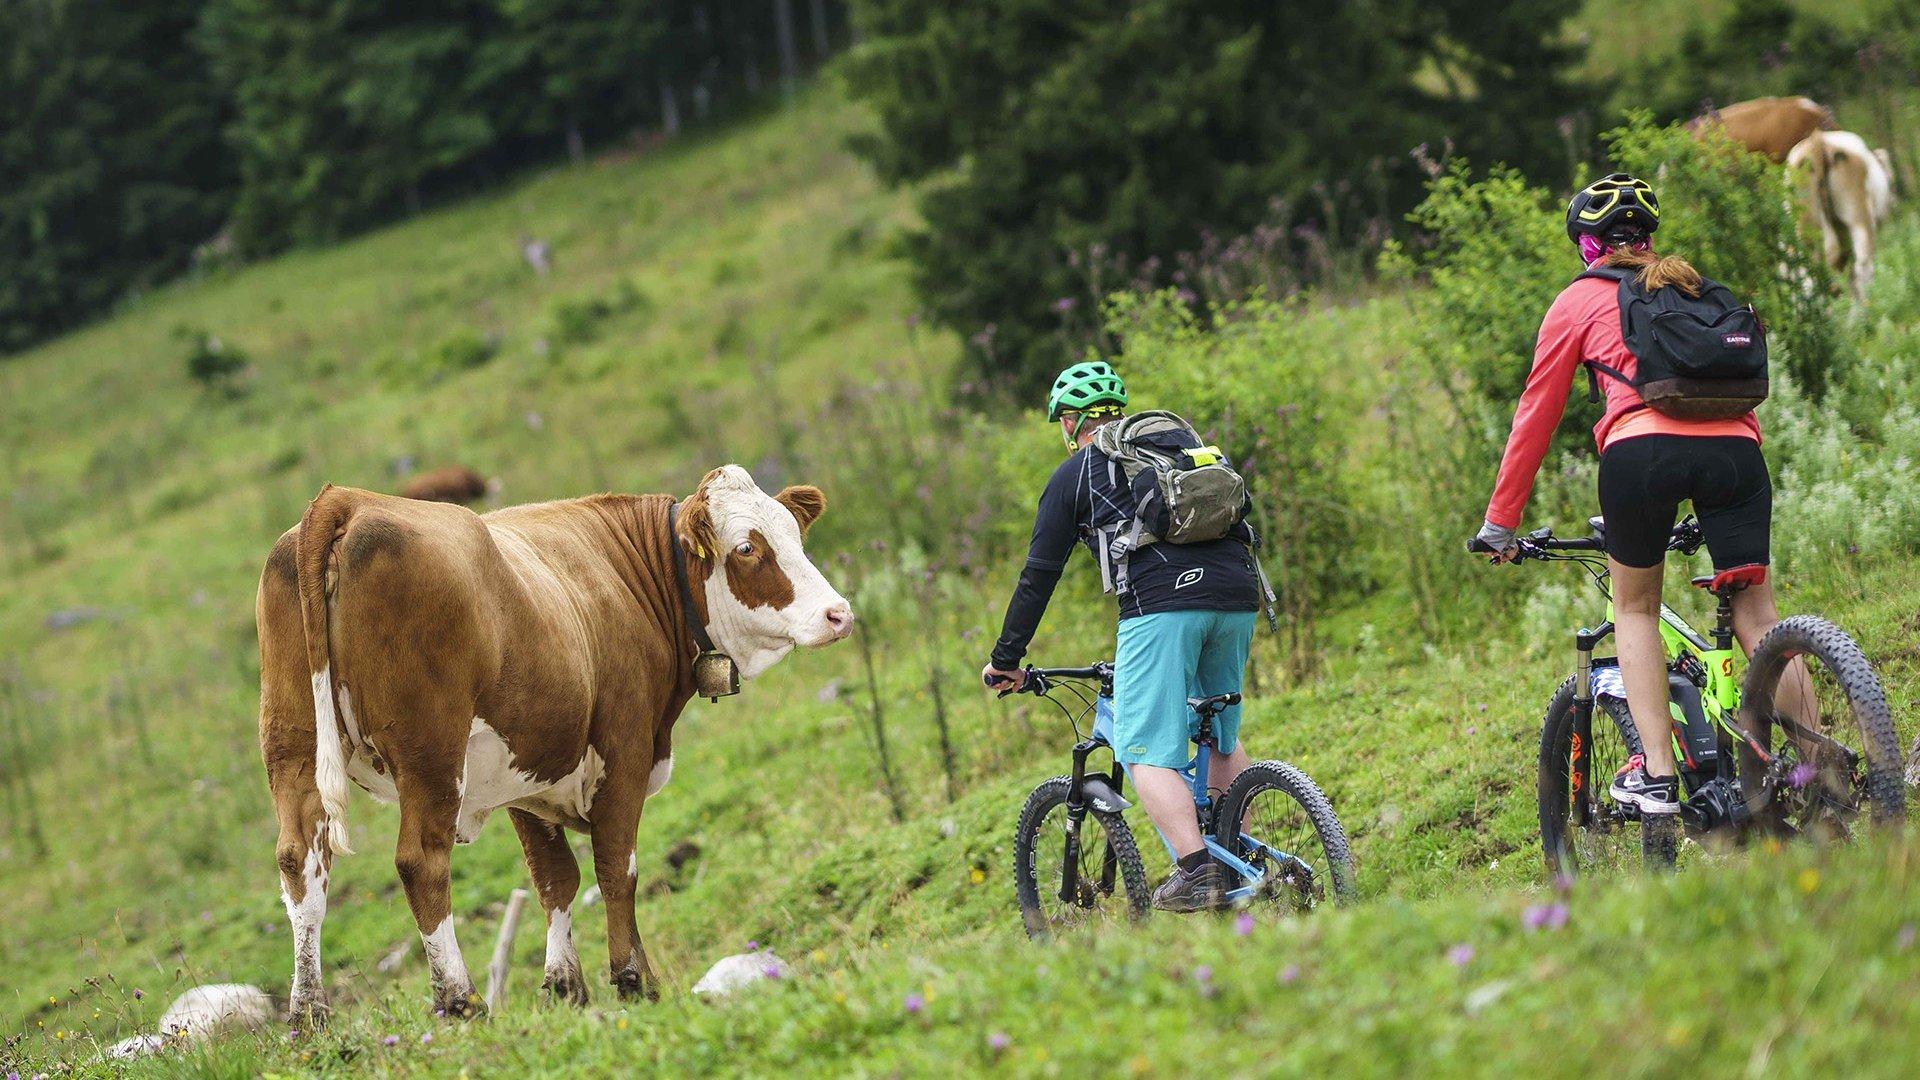 MTB Alm Radtour, © Dietmar Denger